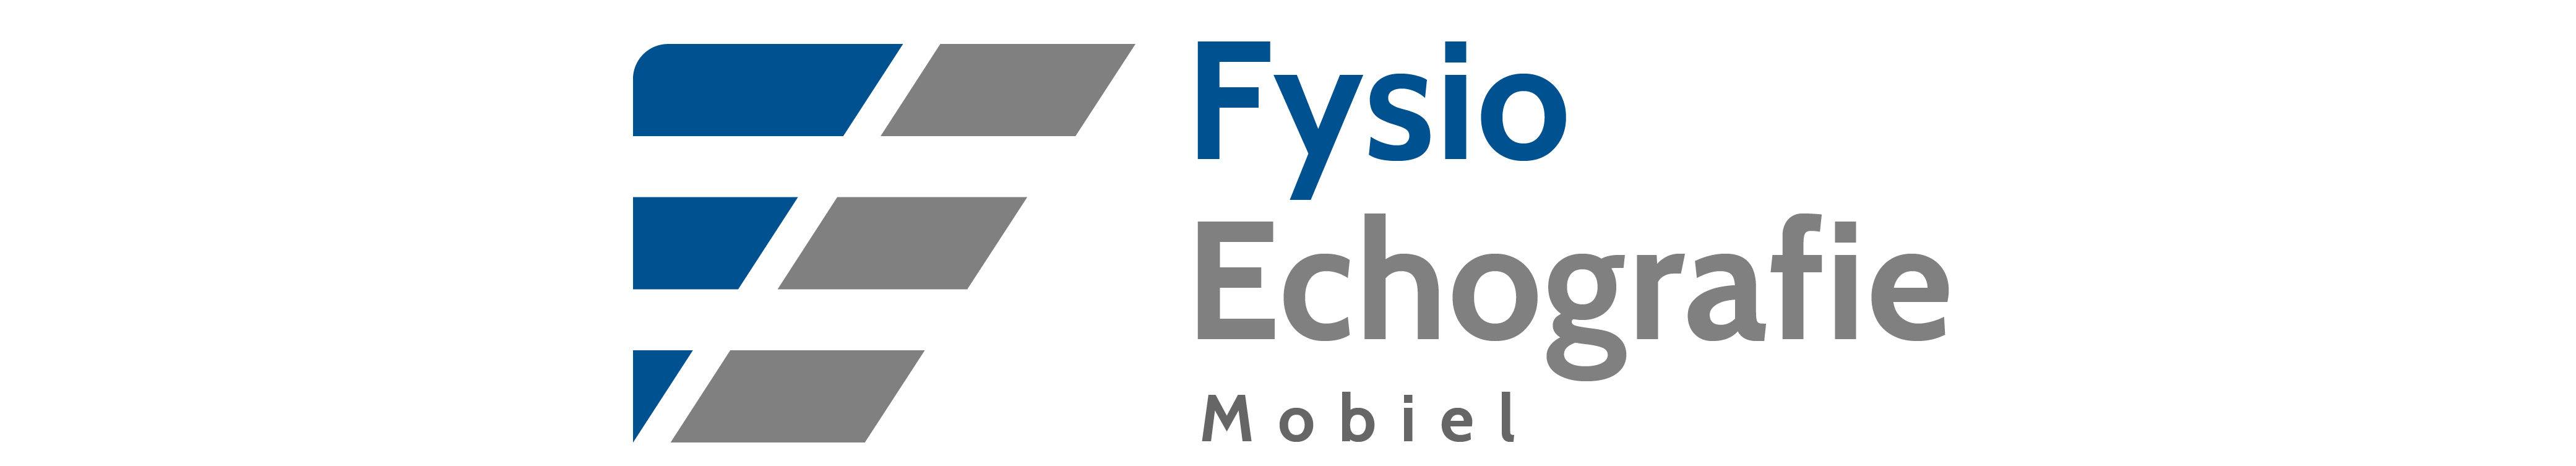 FysioEchografie Mobiel